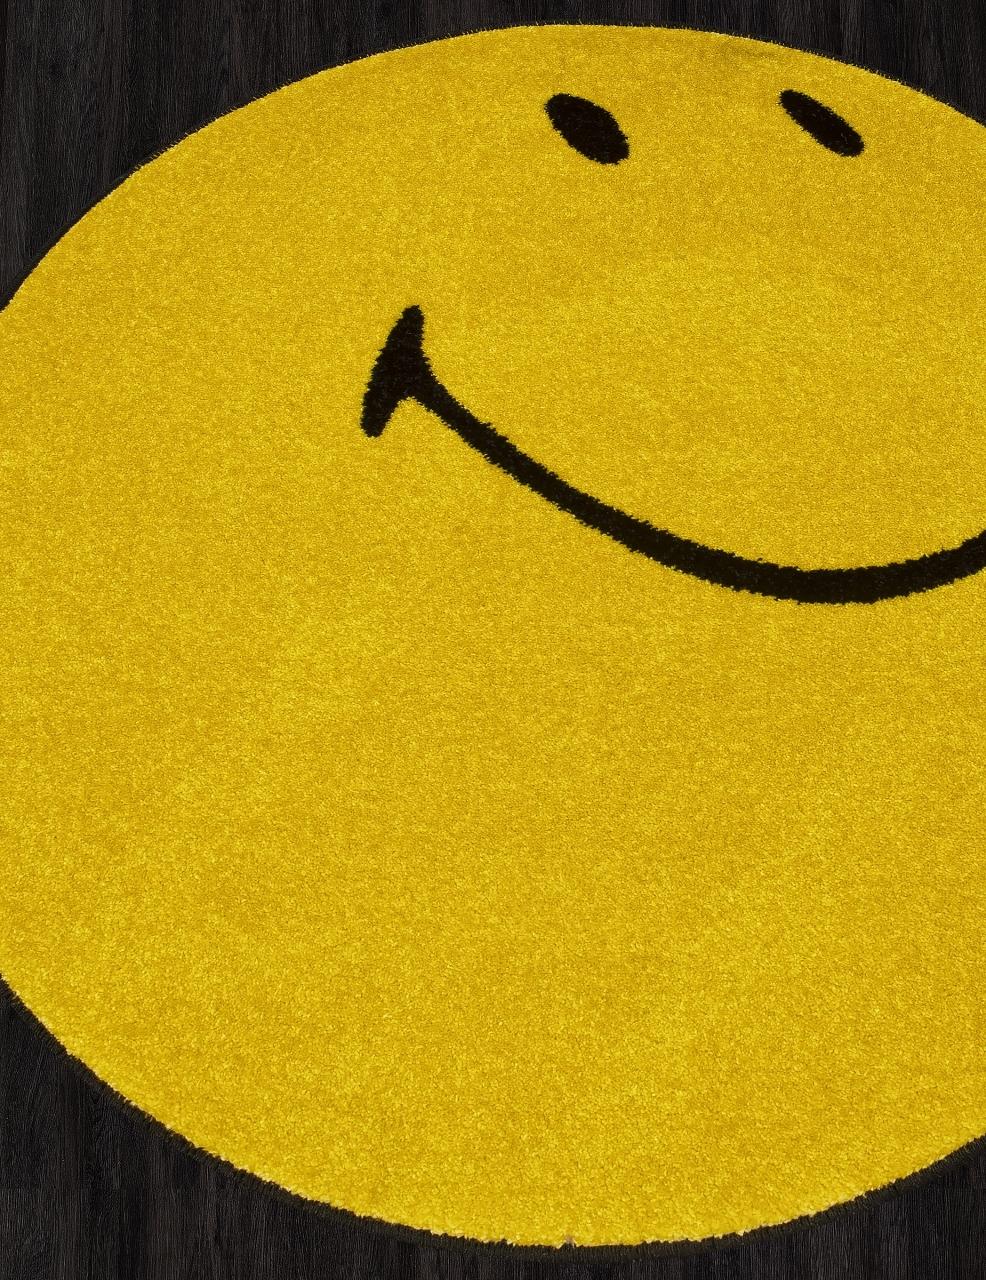 Ковер NC21 - YELLOW - Круг - коллекция SMILE